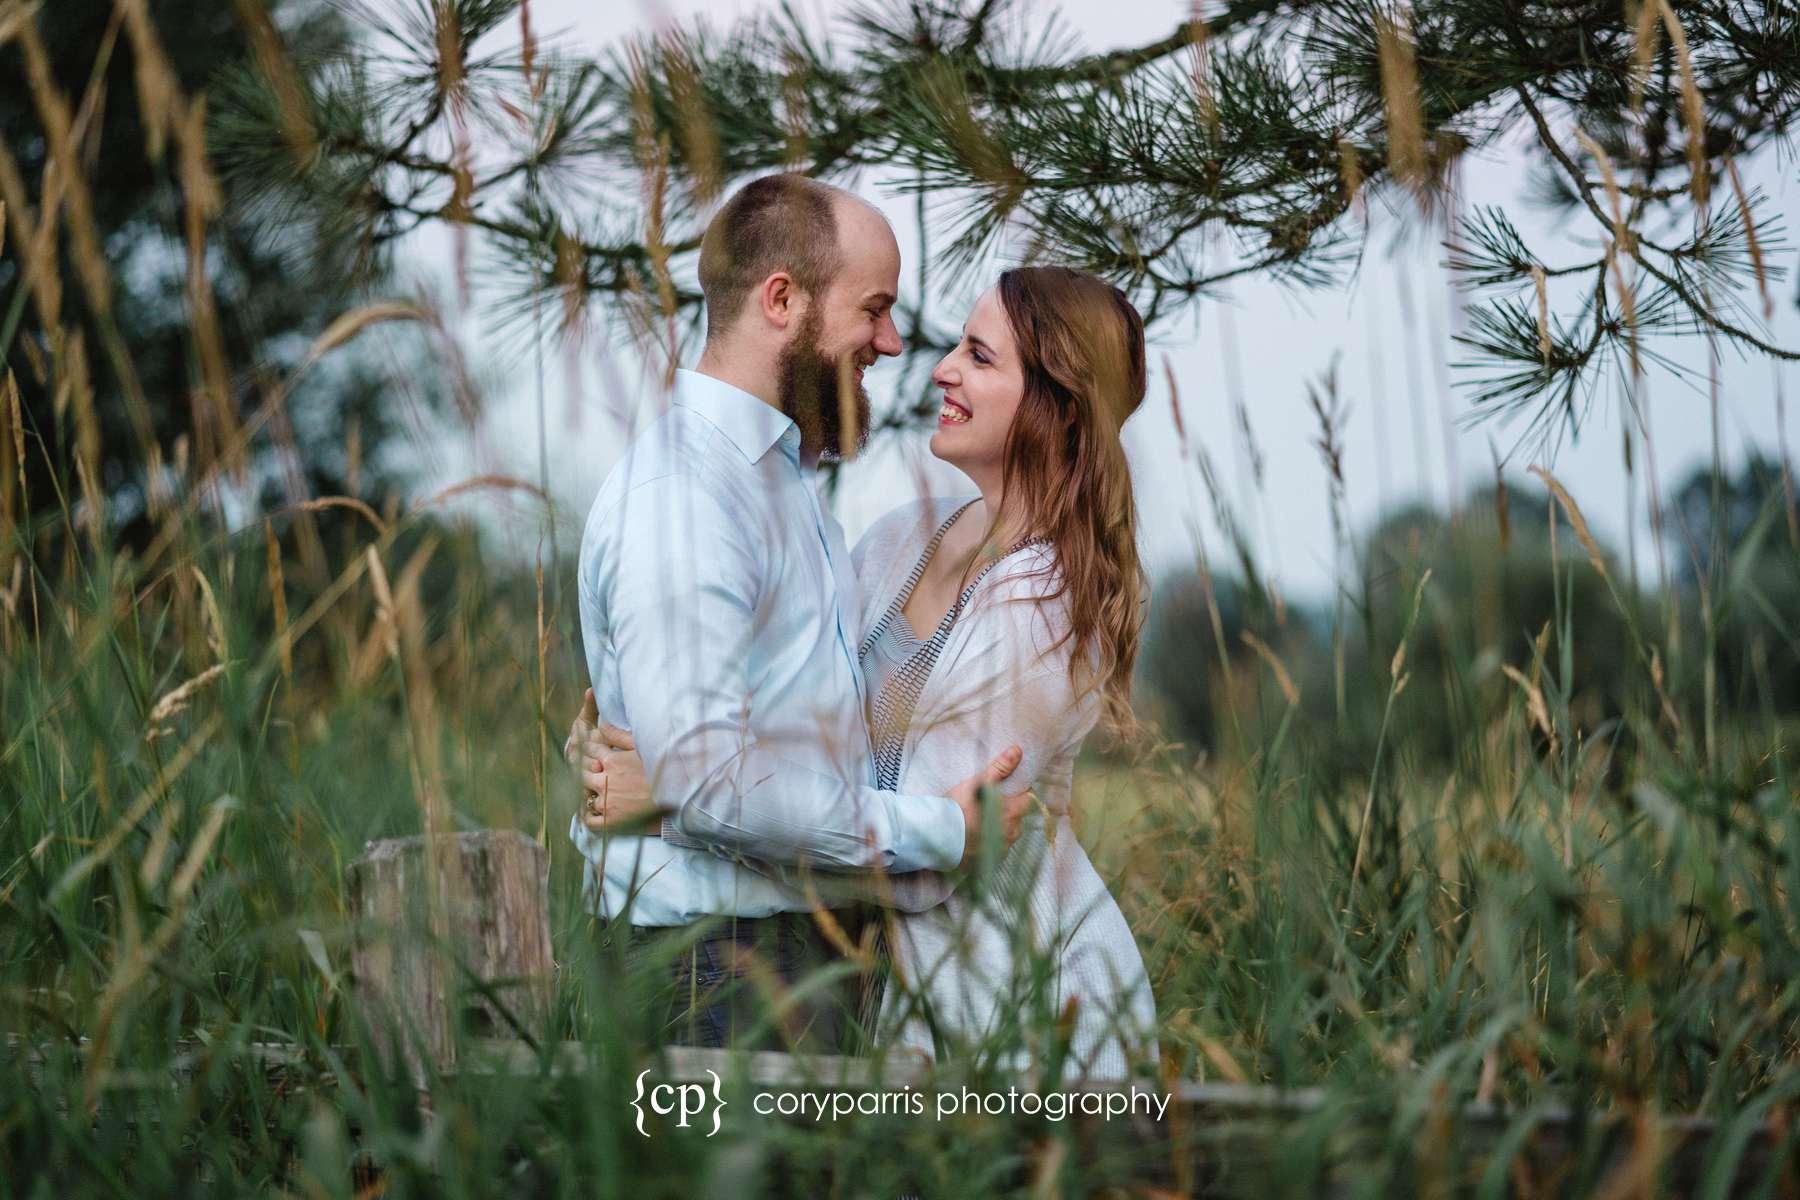 078-Engagement-Portraits-Marrymoor-Park.jpg